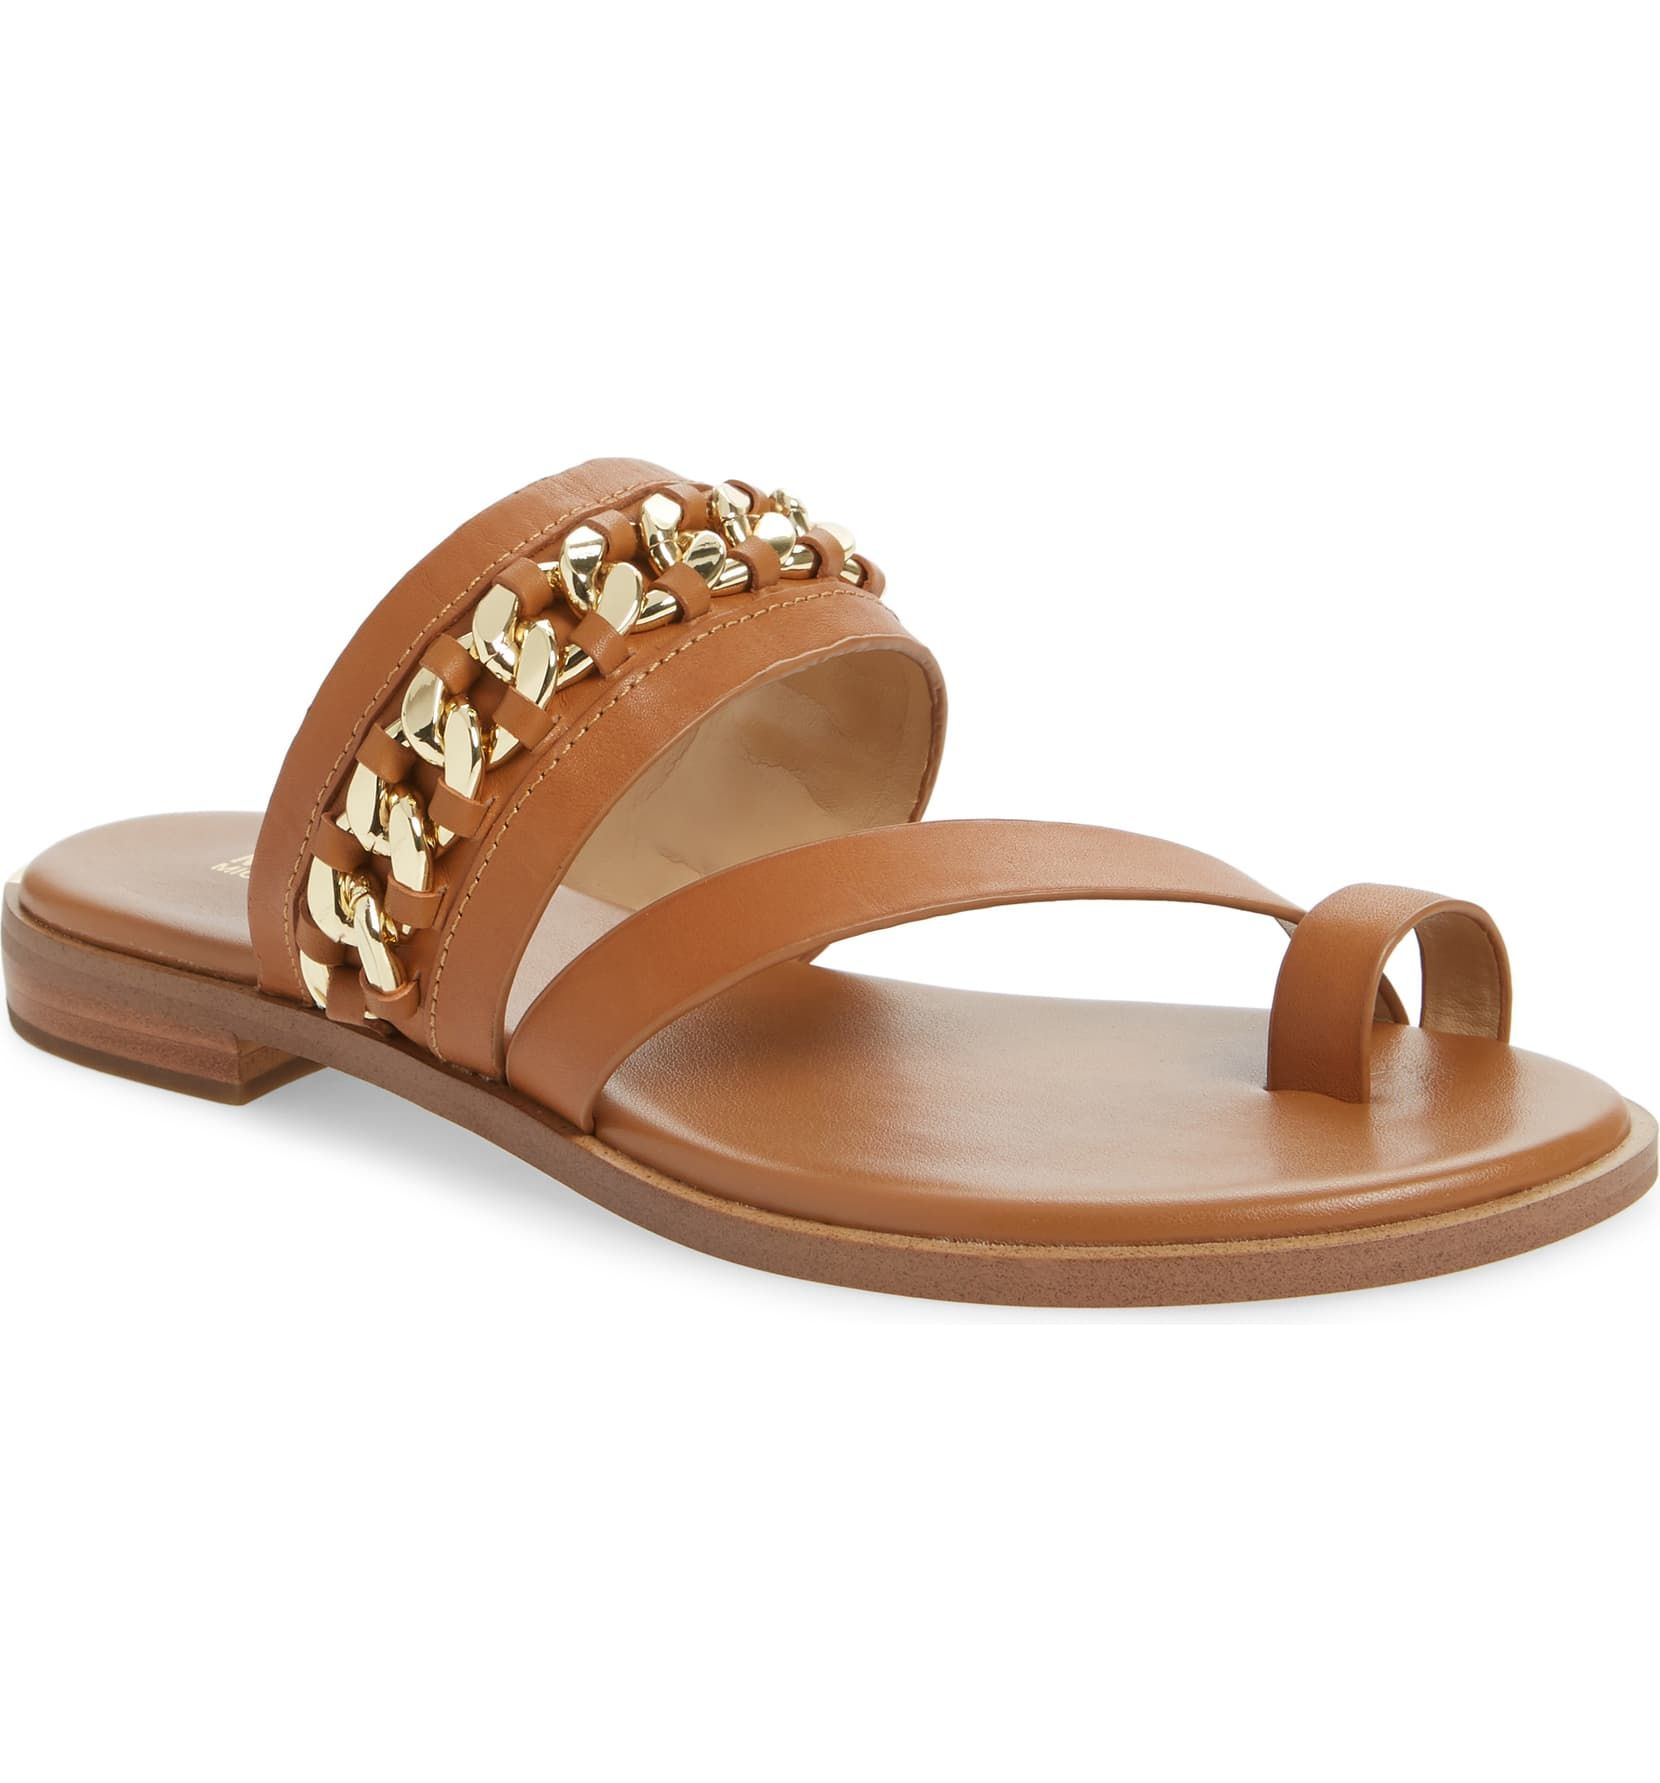 Emily Ratajkowski's Shoes Are Spring's Weirdest Sandal Trend 11